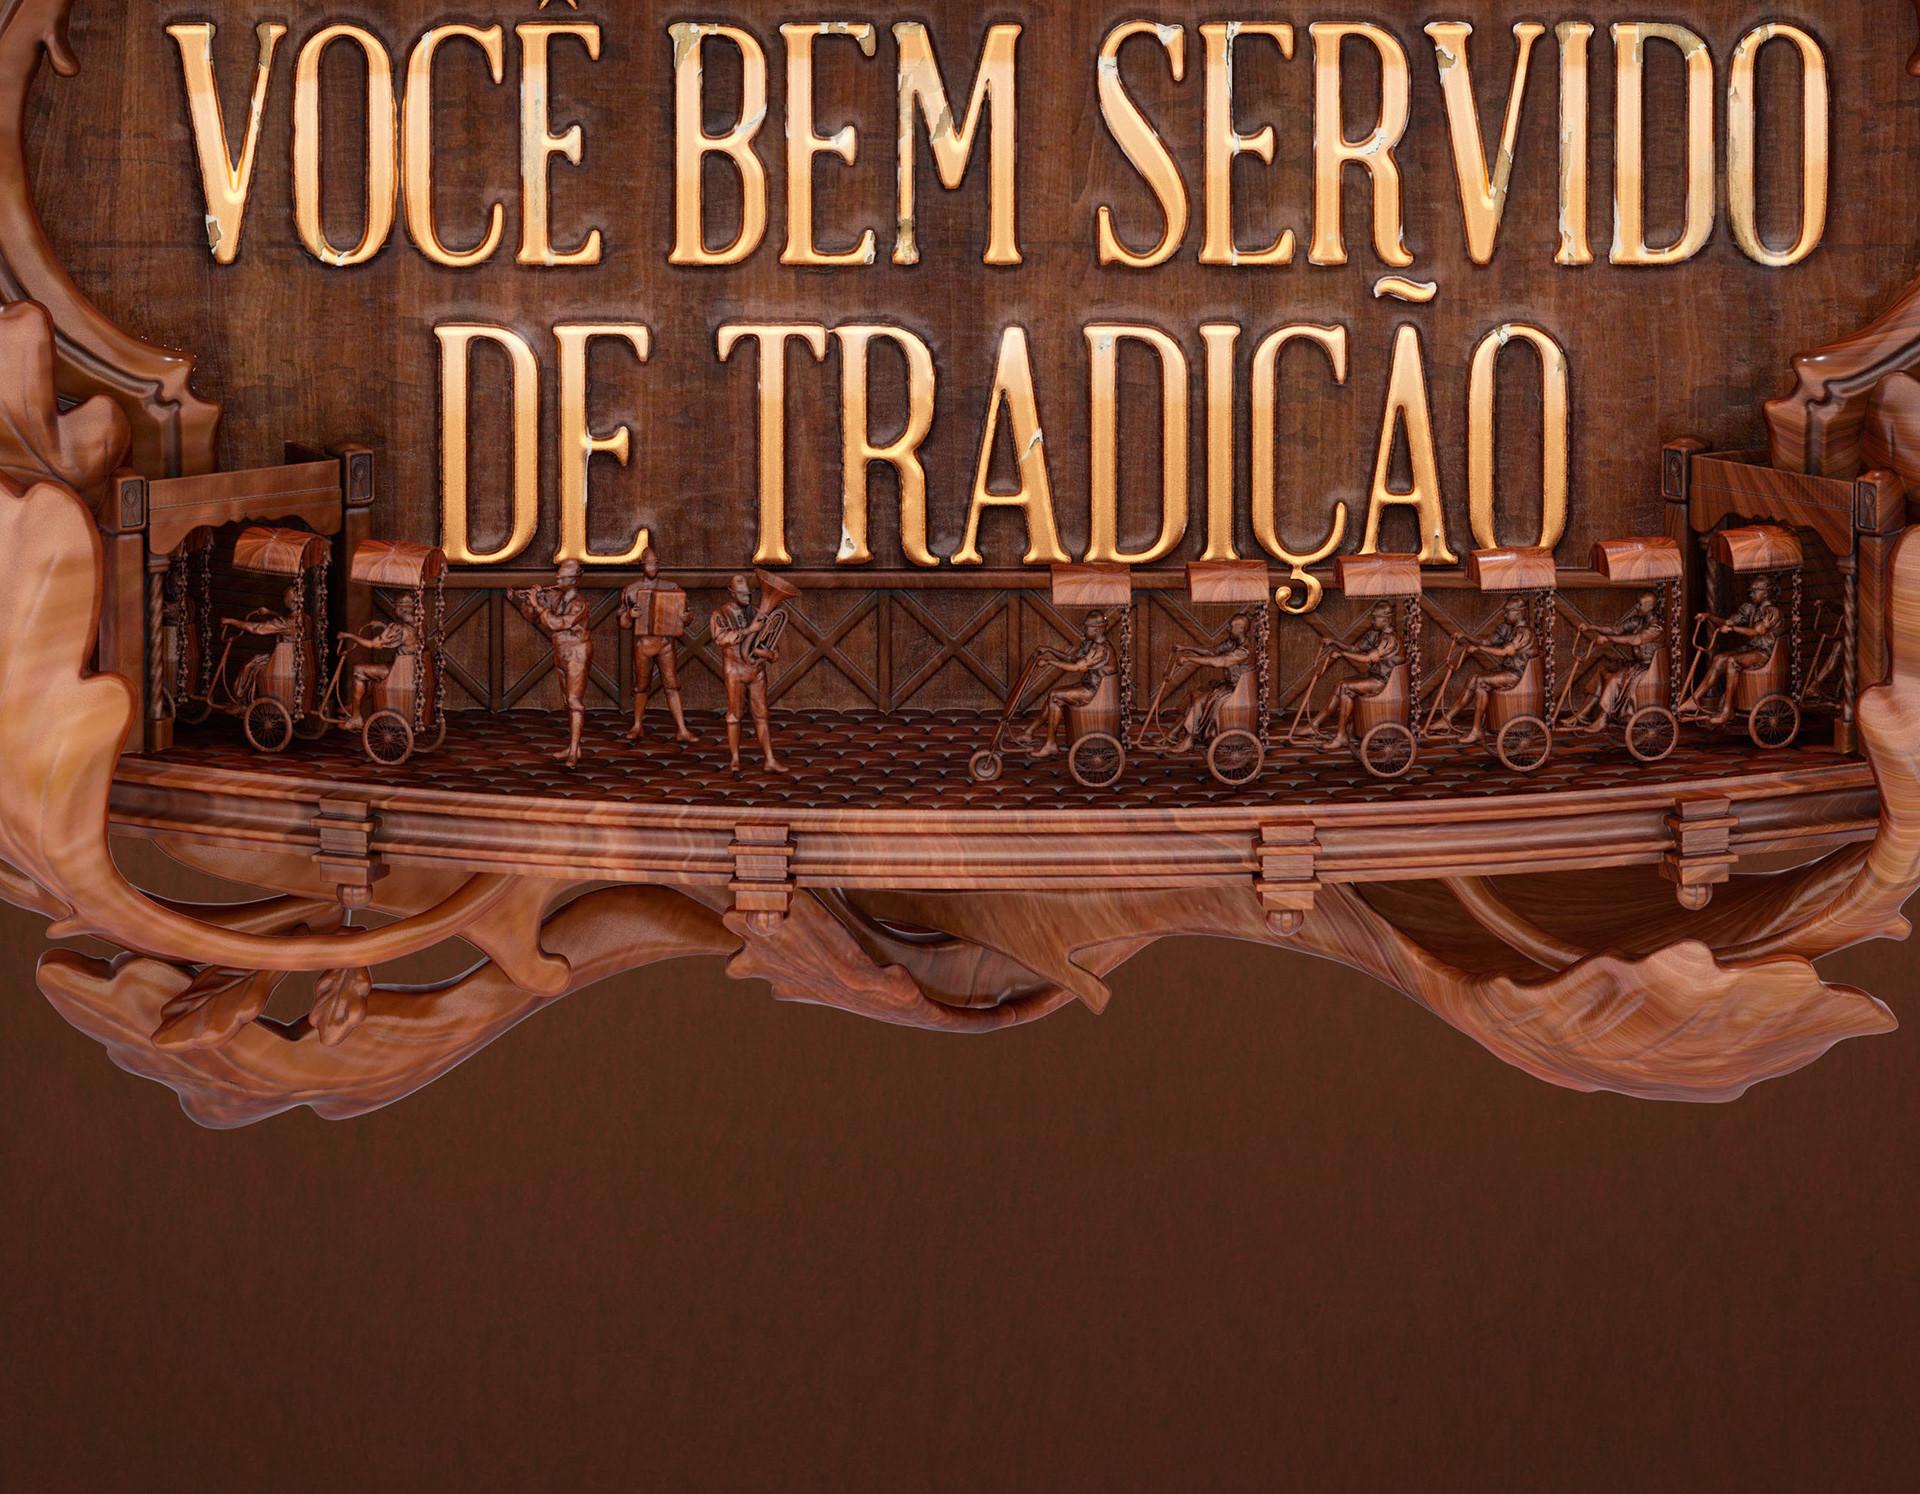 Leandro soares 18ea44ddfebf00219c40cf25 rw 1920